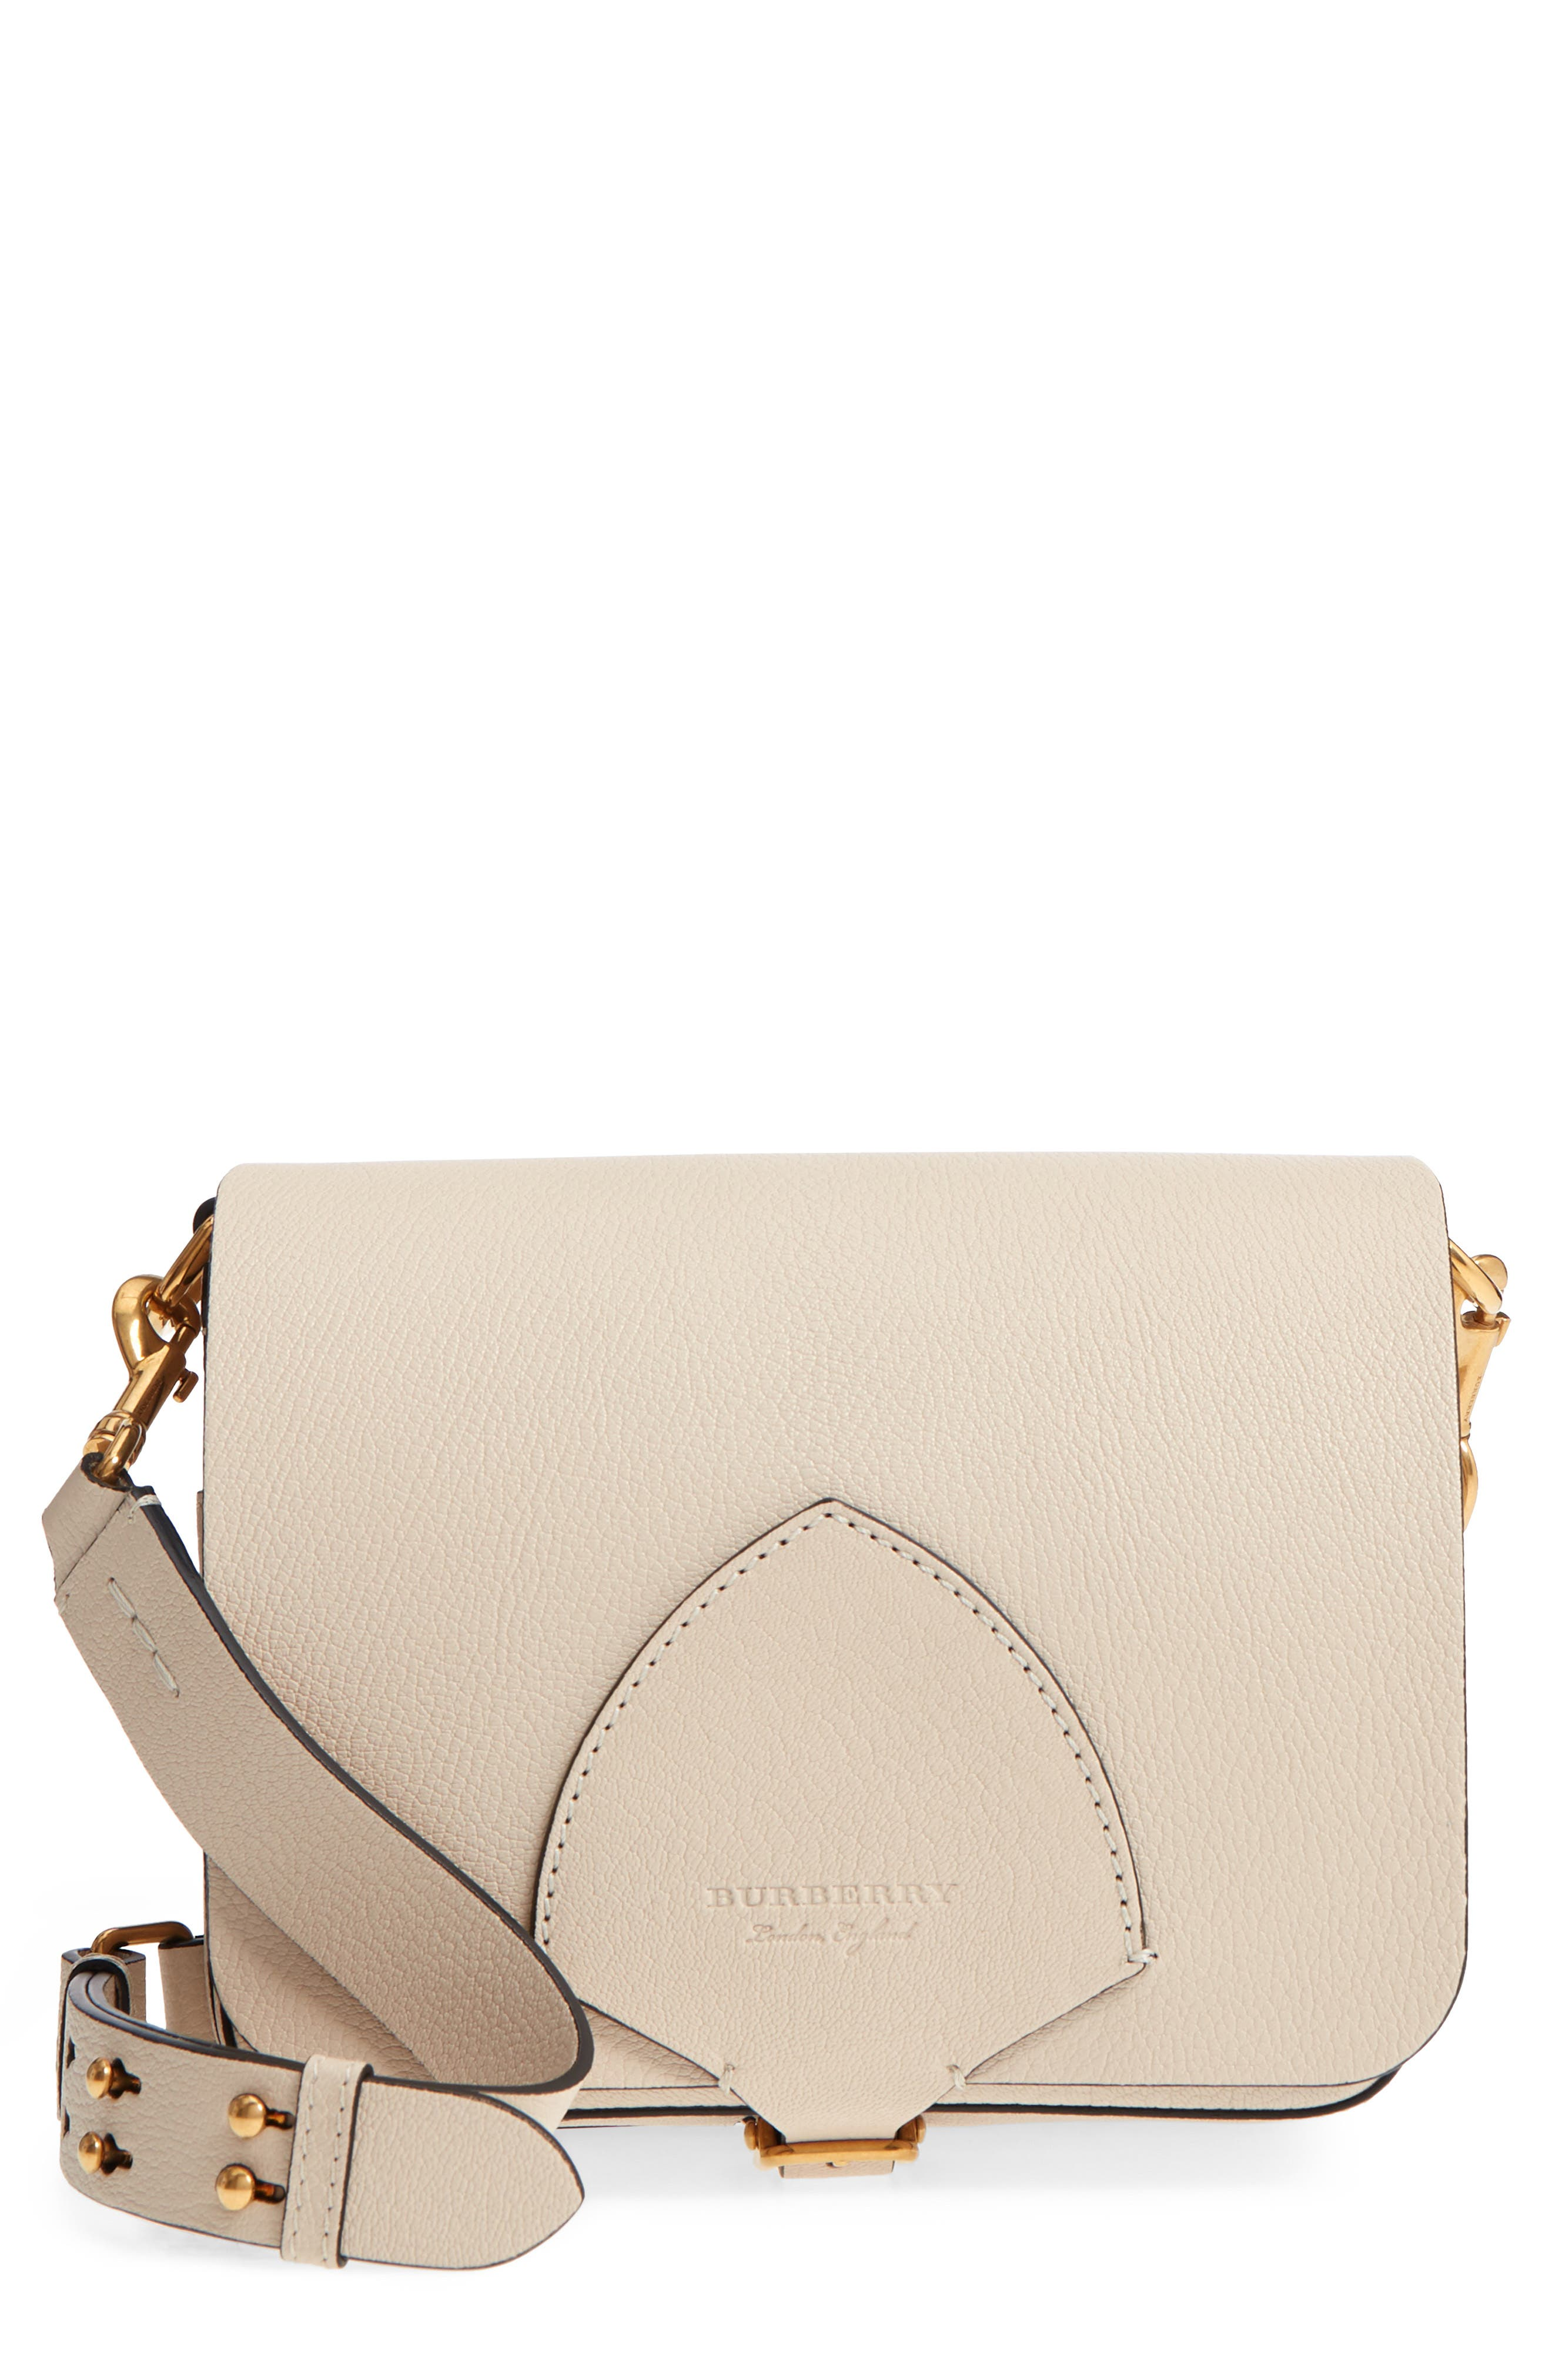 Square Leather Shoulder Bag,                             Main thumbnail 1, color,                             250